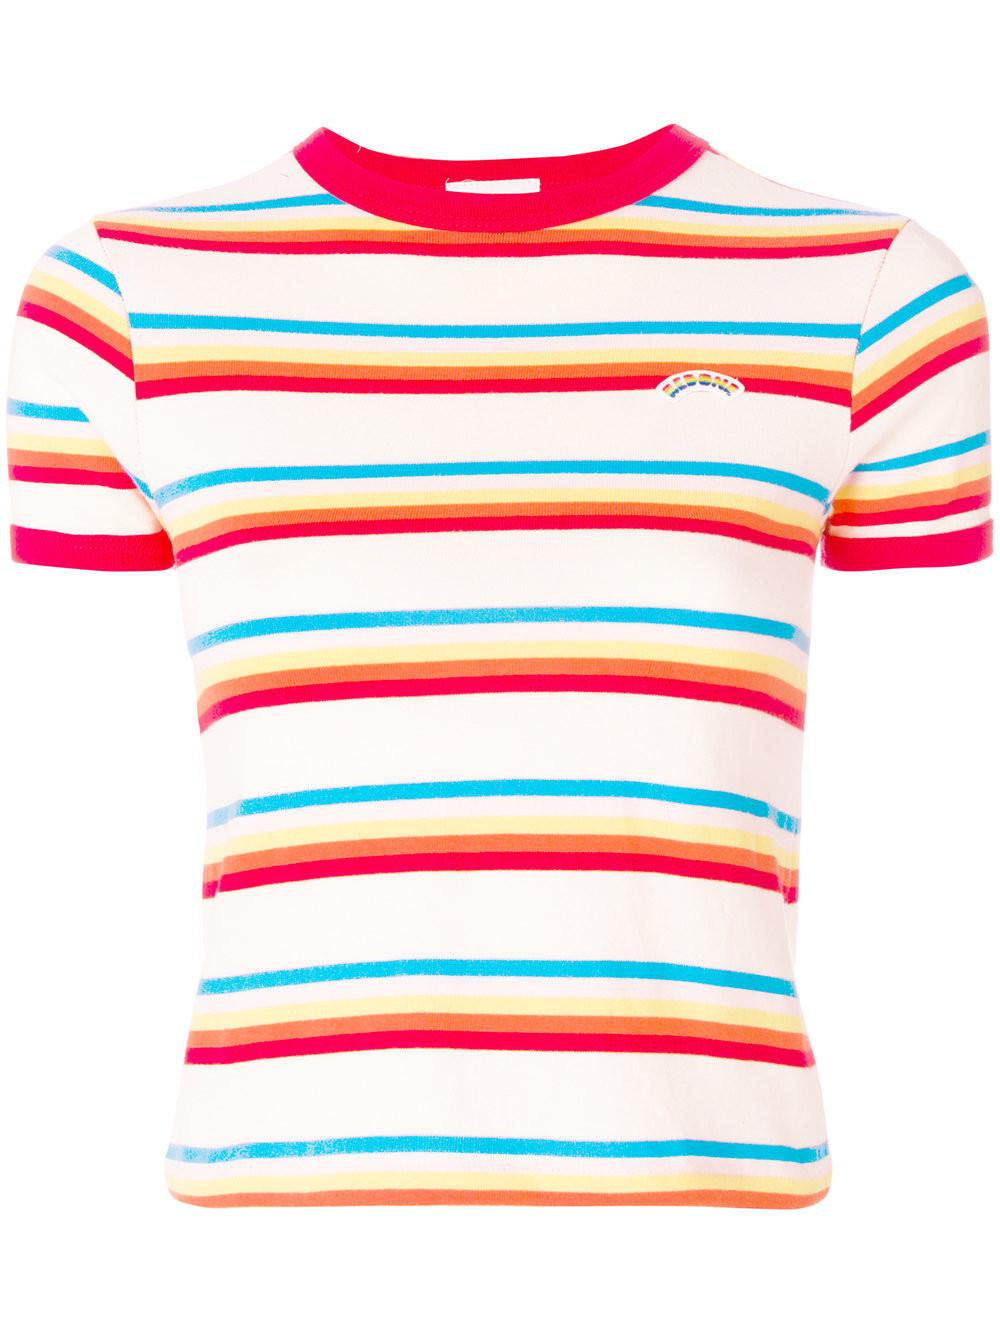 Joseph striped blouse - Nude & Neutrals